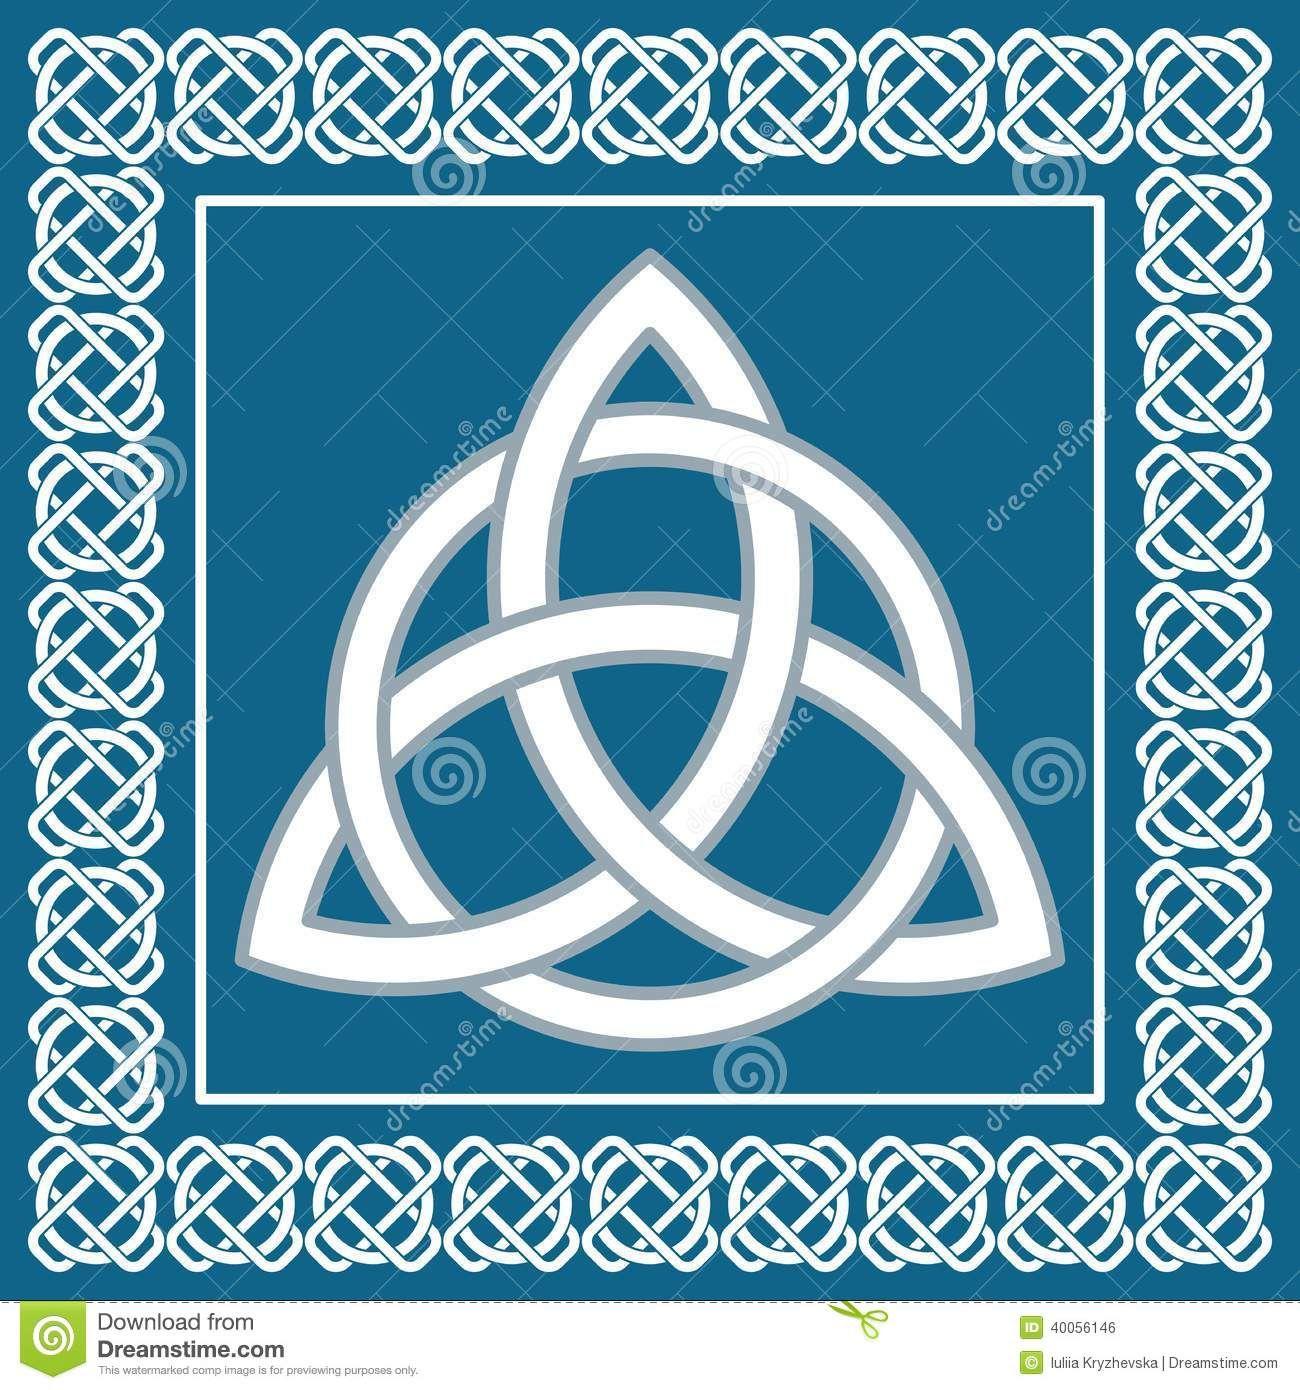 Symbol For Elements Google Search Sacred Geomandalic Artismo